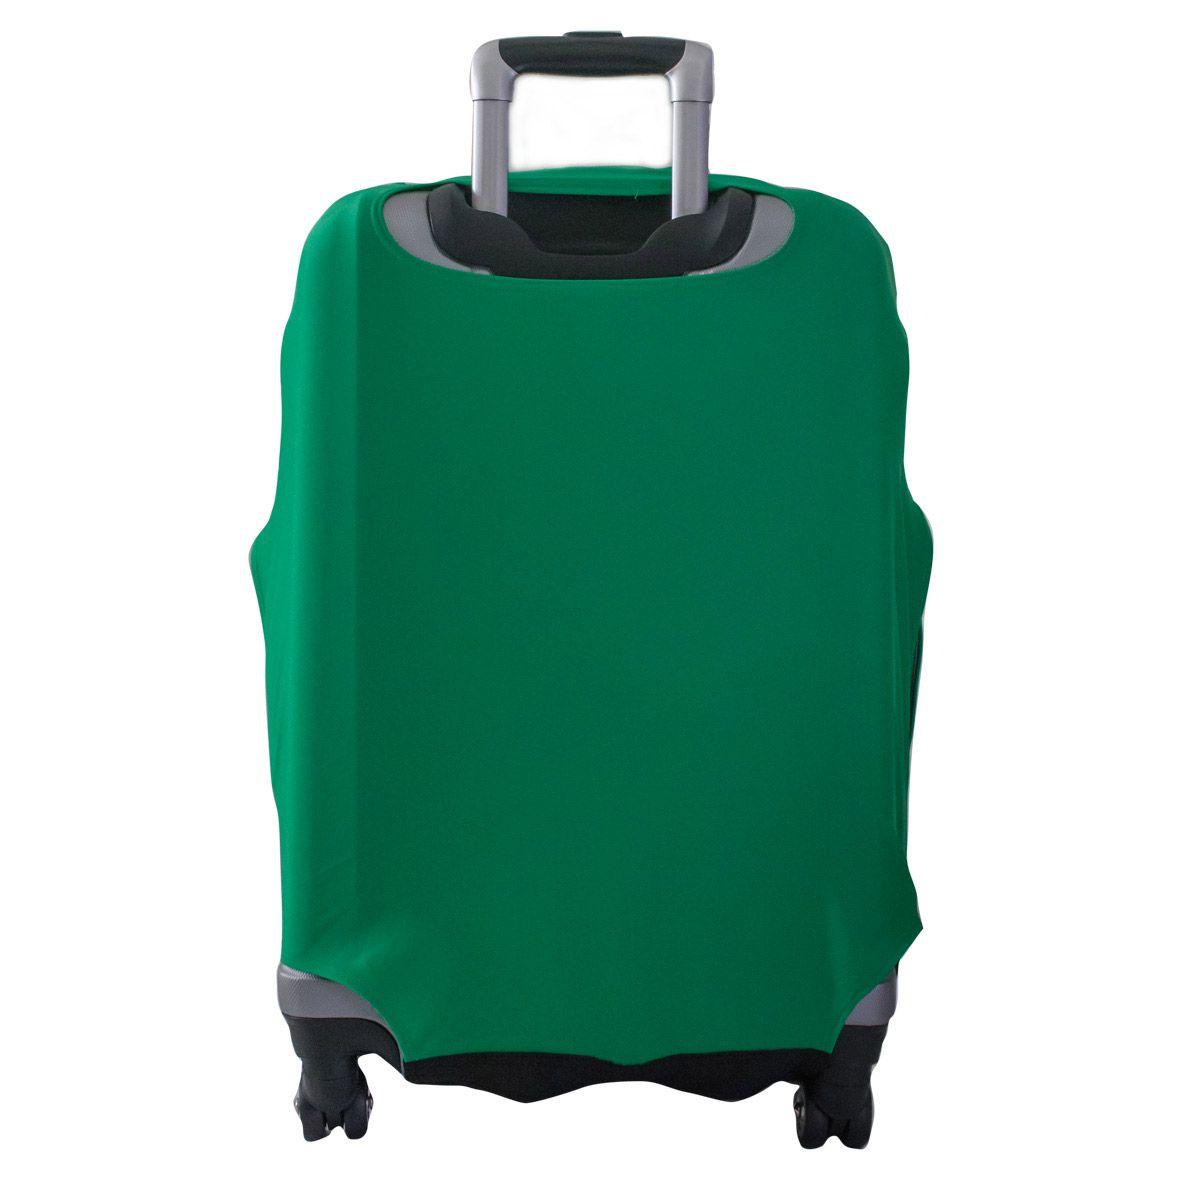 Capa Para Mala Lisa Verde Bandeira - Skinbag